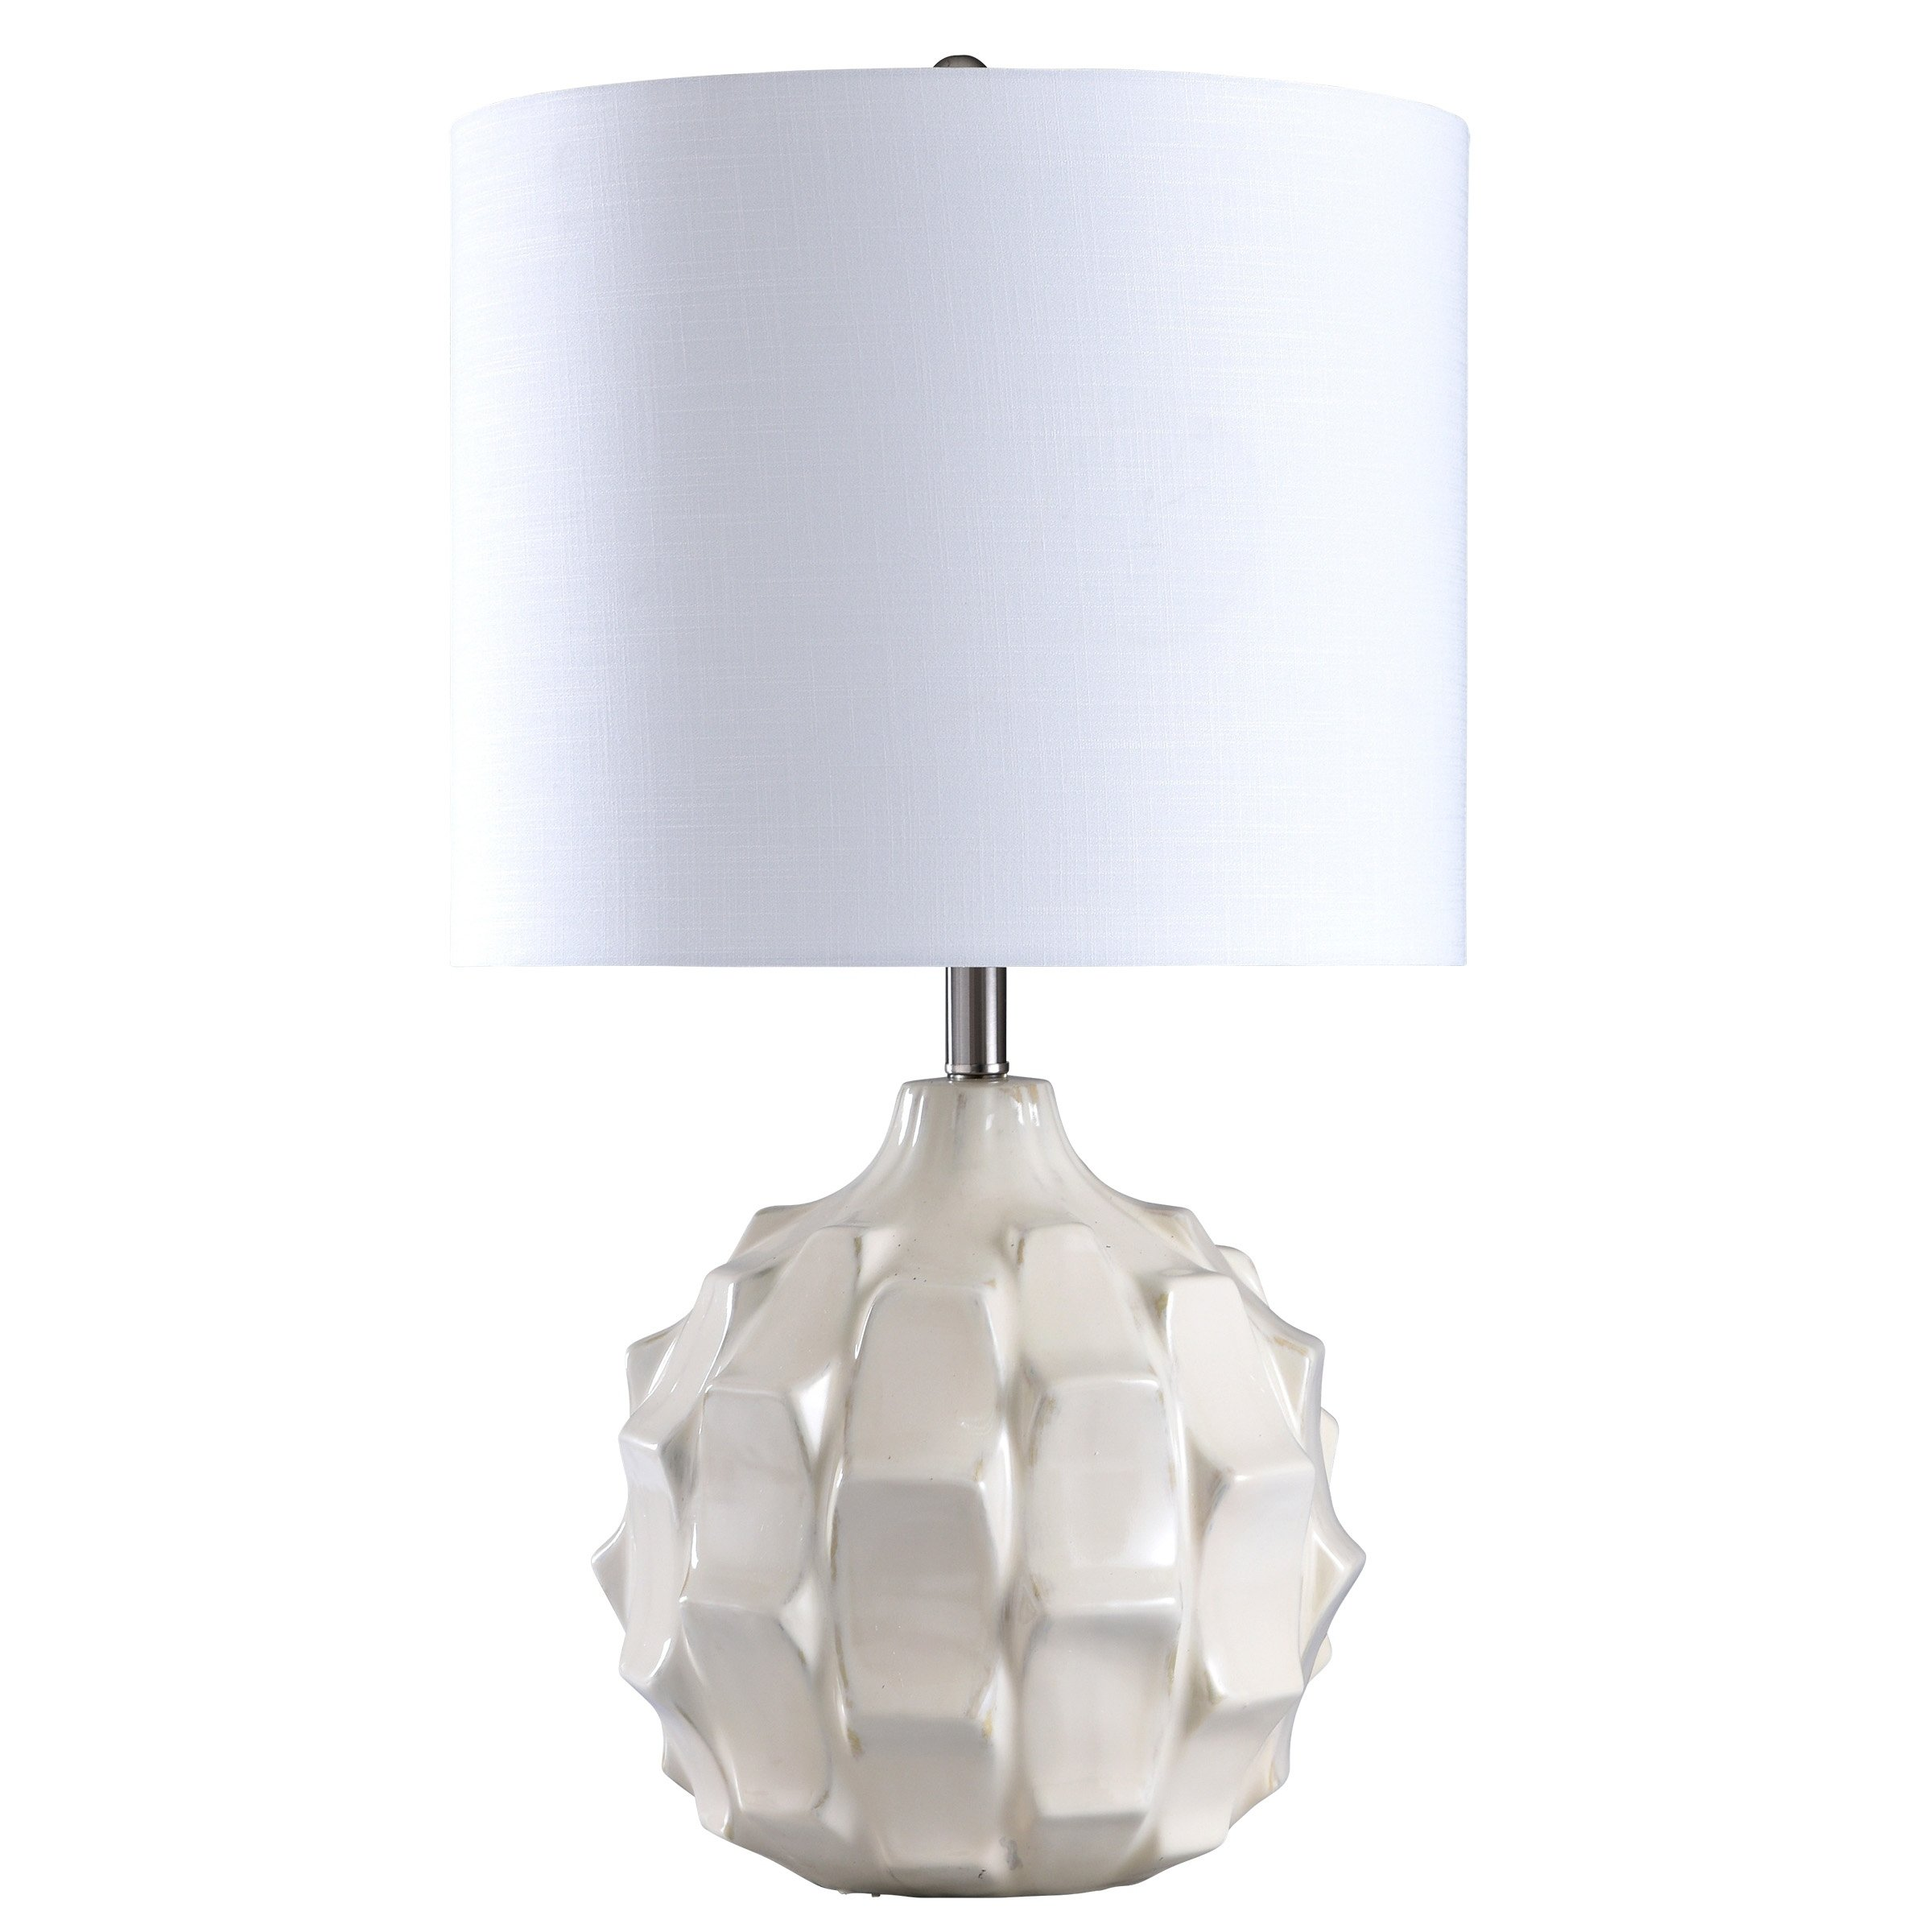 Naxos White Ceramic Table Lamp White Shade In 2019 White Table Lamp Ceramic Table Lamps Table Lamp